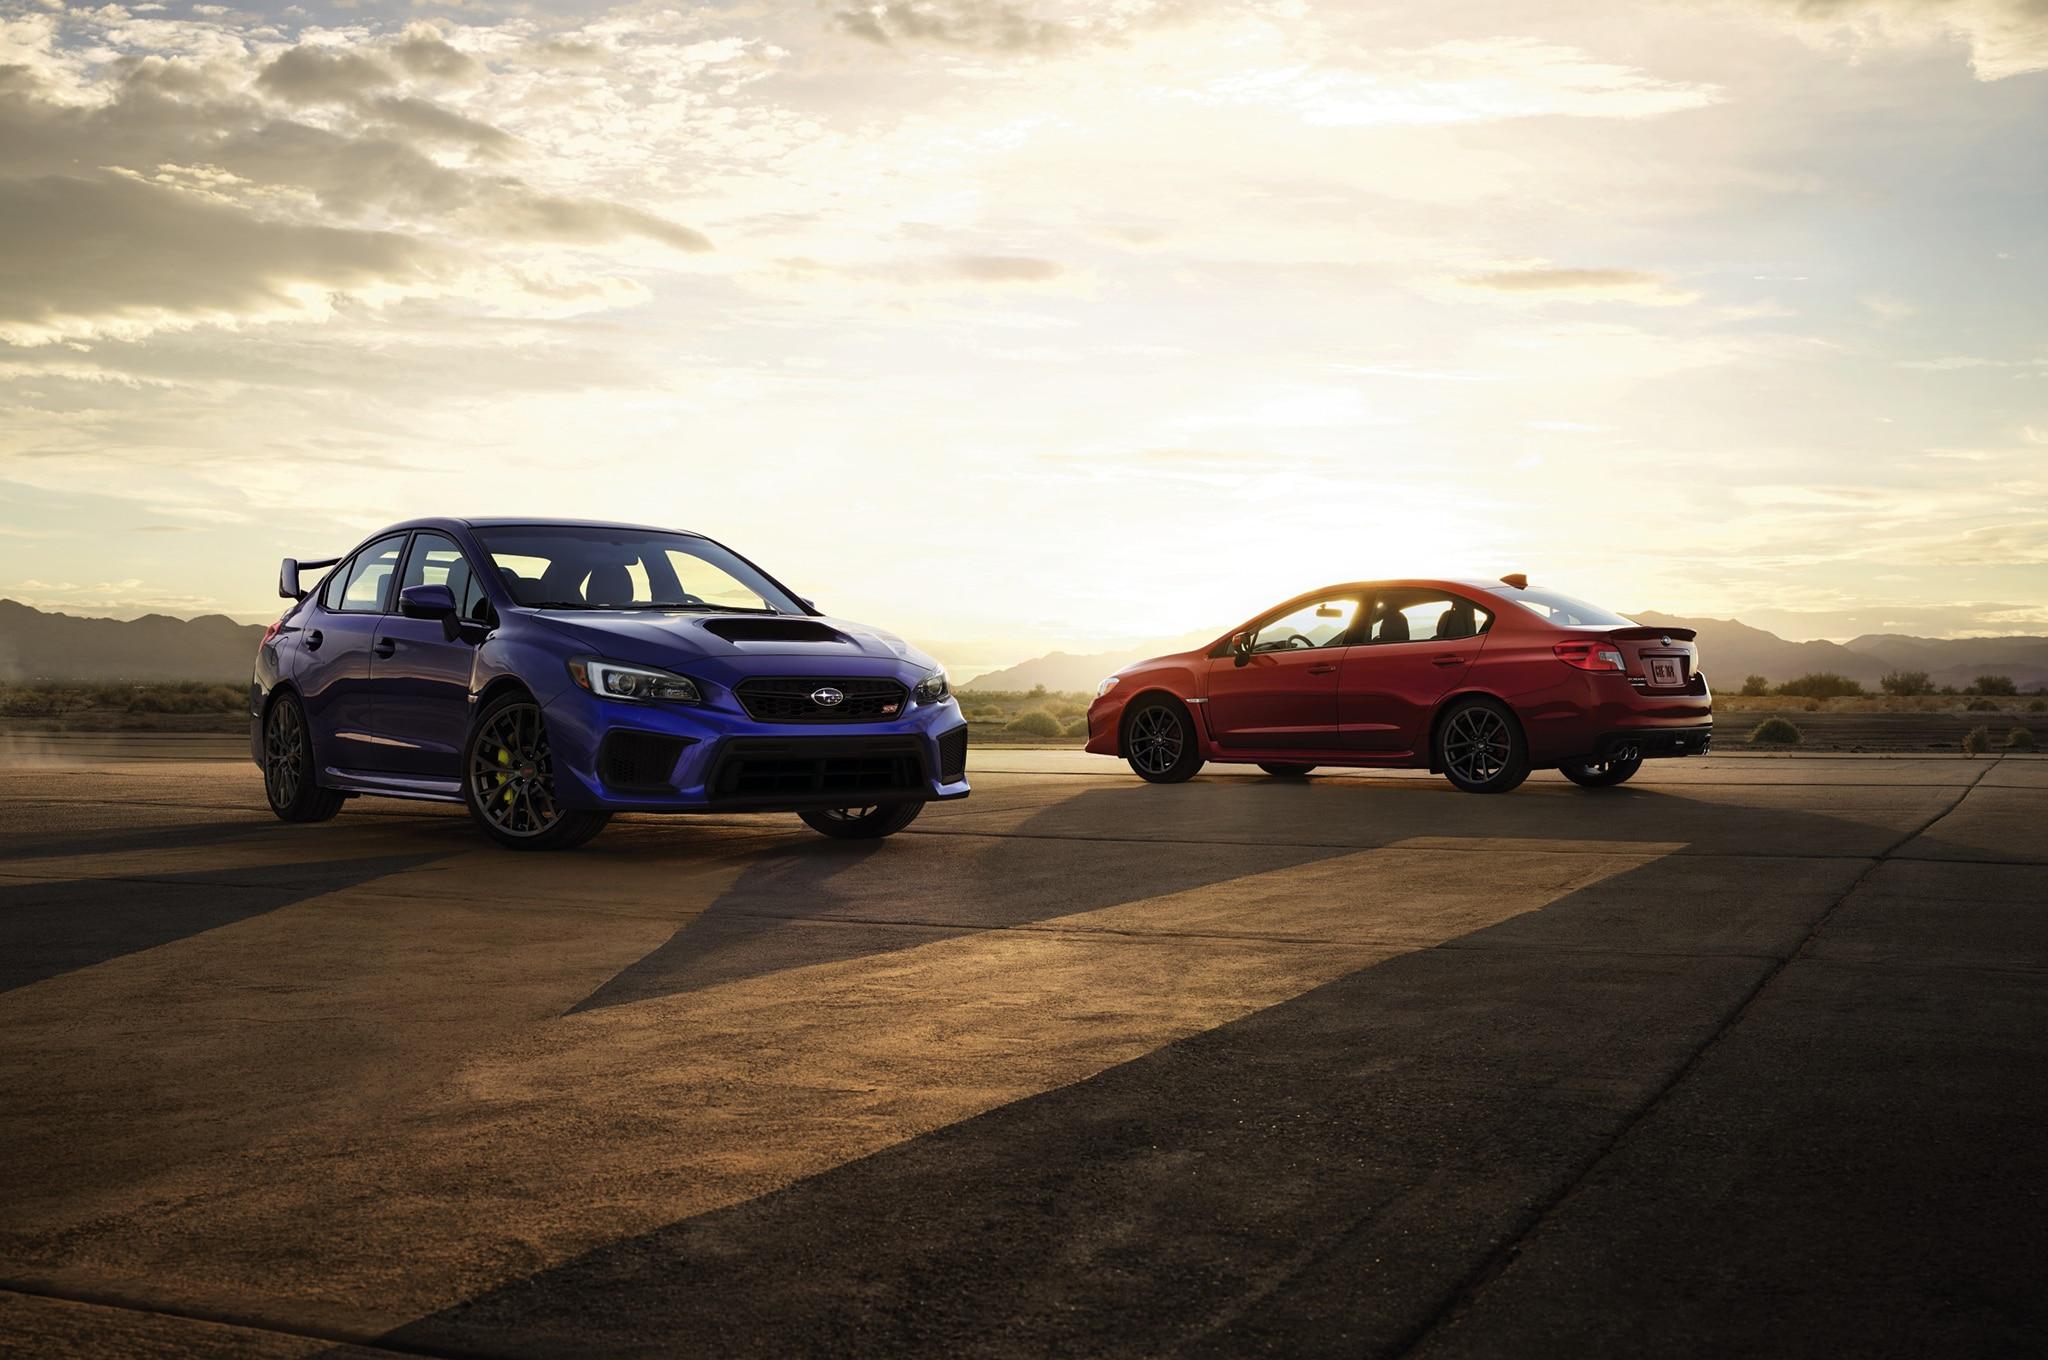 2018 Subaru WRX And Subaru WRX STI Together